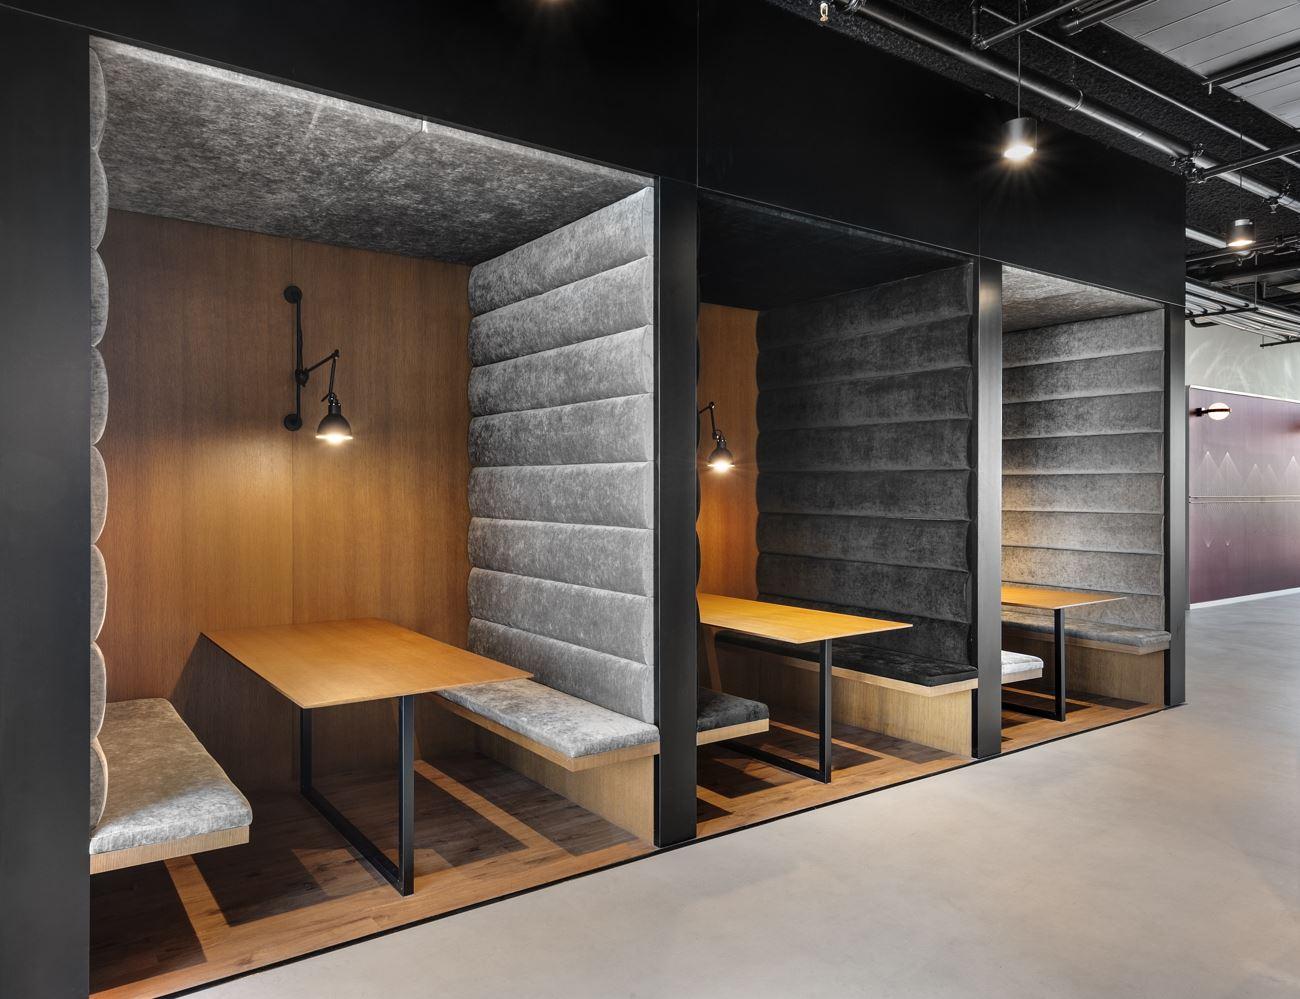 Innovation Offices שלחנות האוכל מוארים בגוף תאורה מיוחד ומעוצב על ידי קמחי דורי